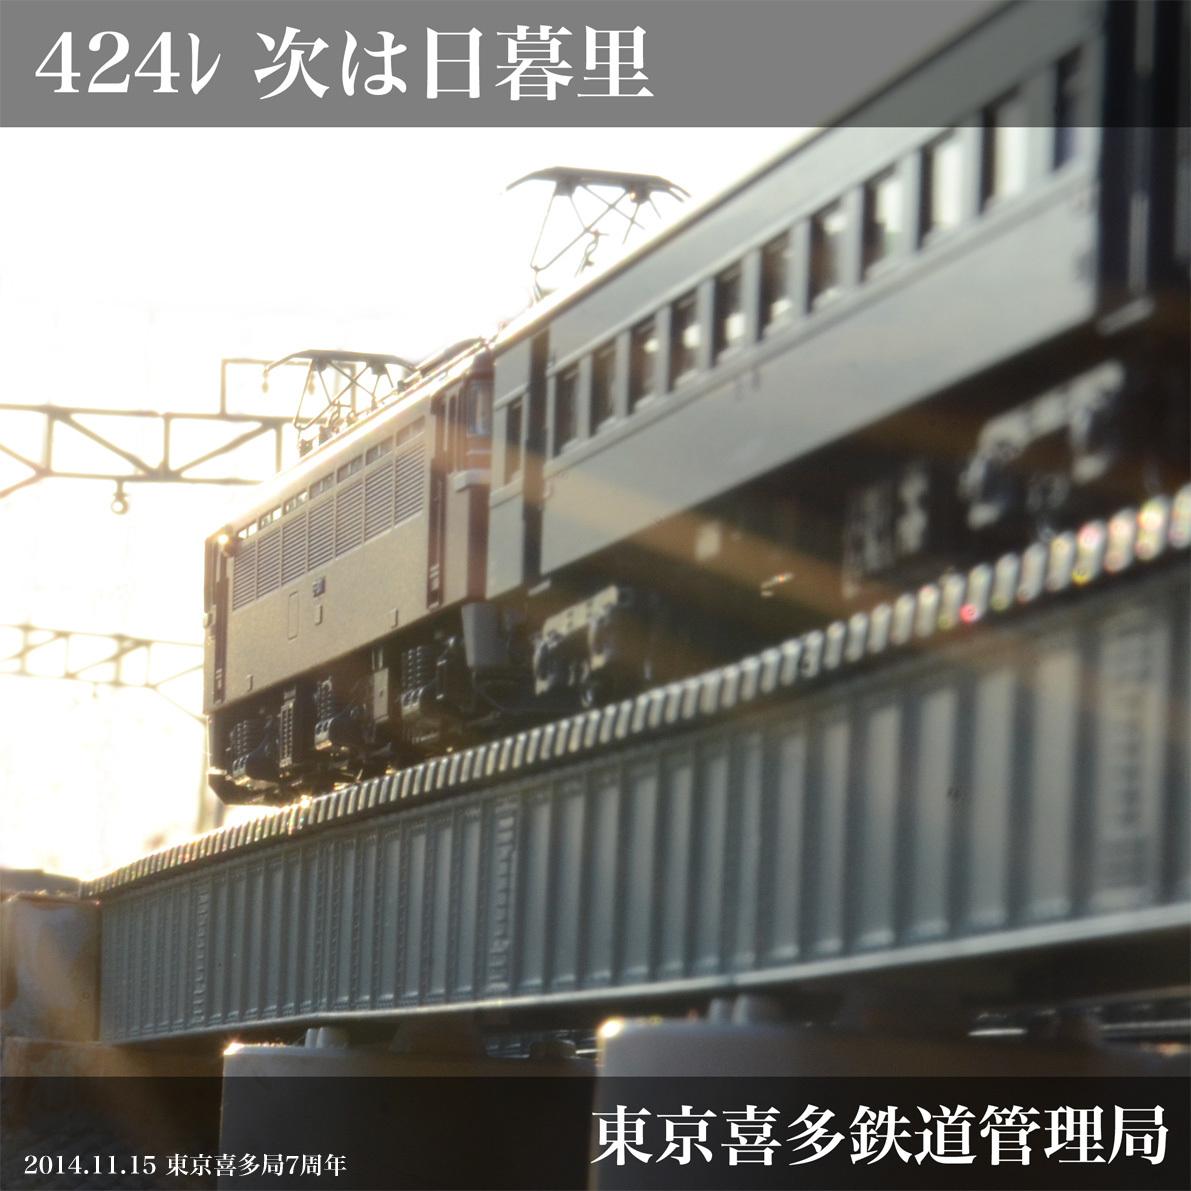 008_141122_top.jpg